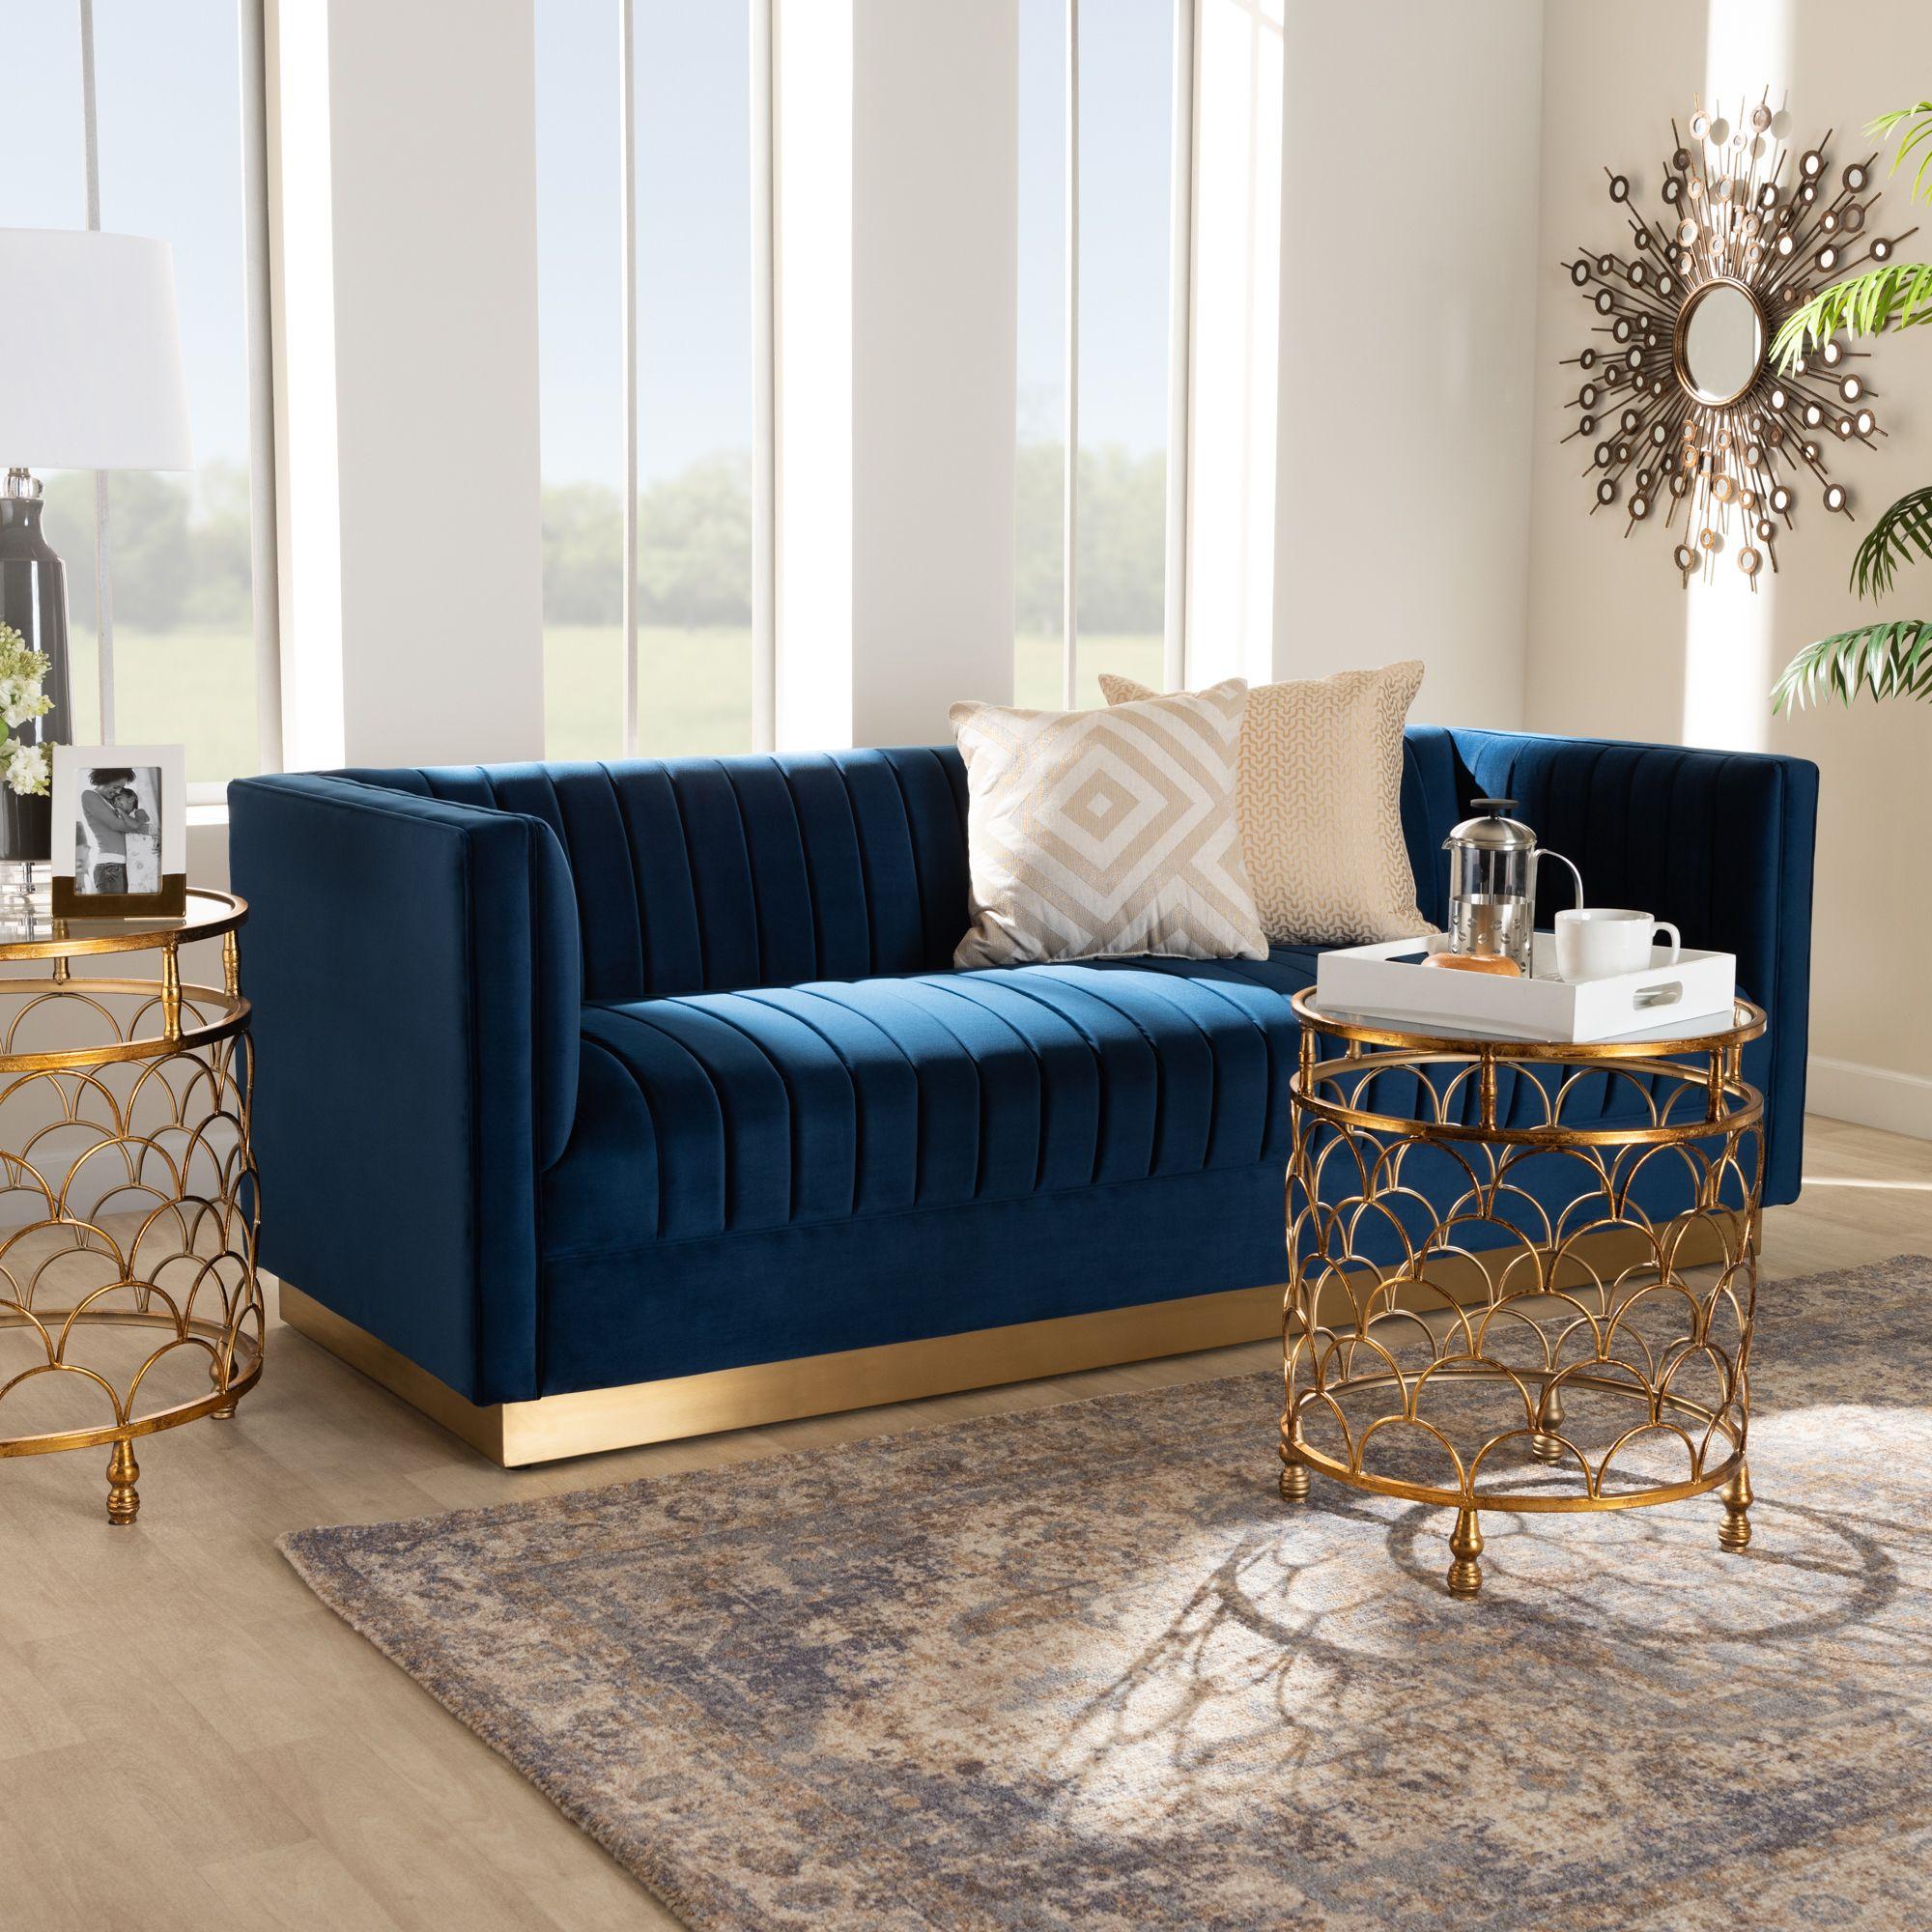 Pin On Living Room Inspo For Designers